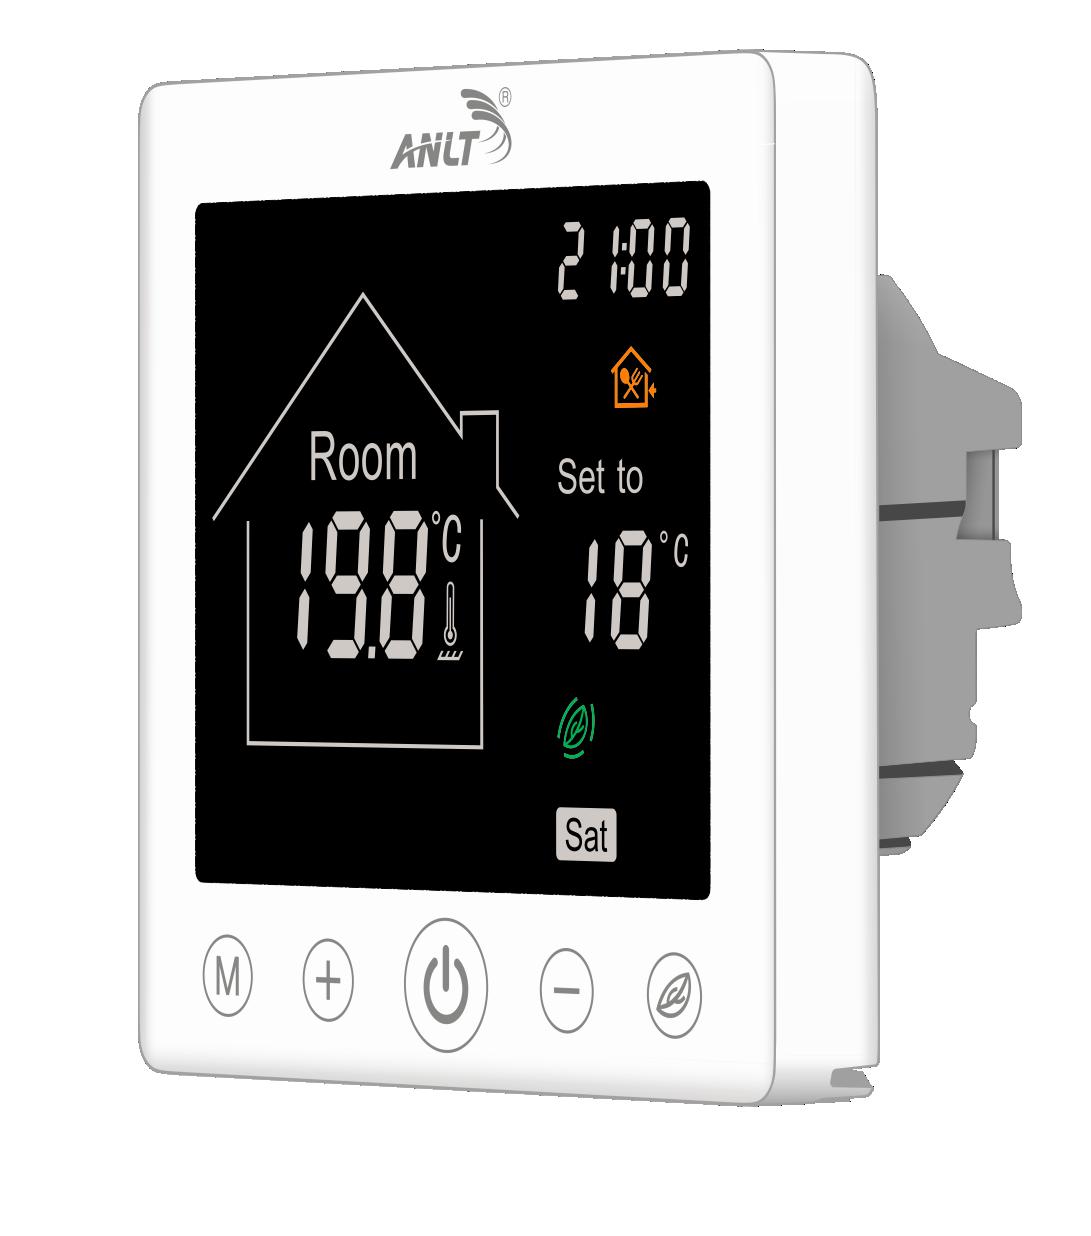 3M2 Floor Heating Mat 450W For Bath Room 110 120 220 230